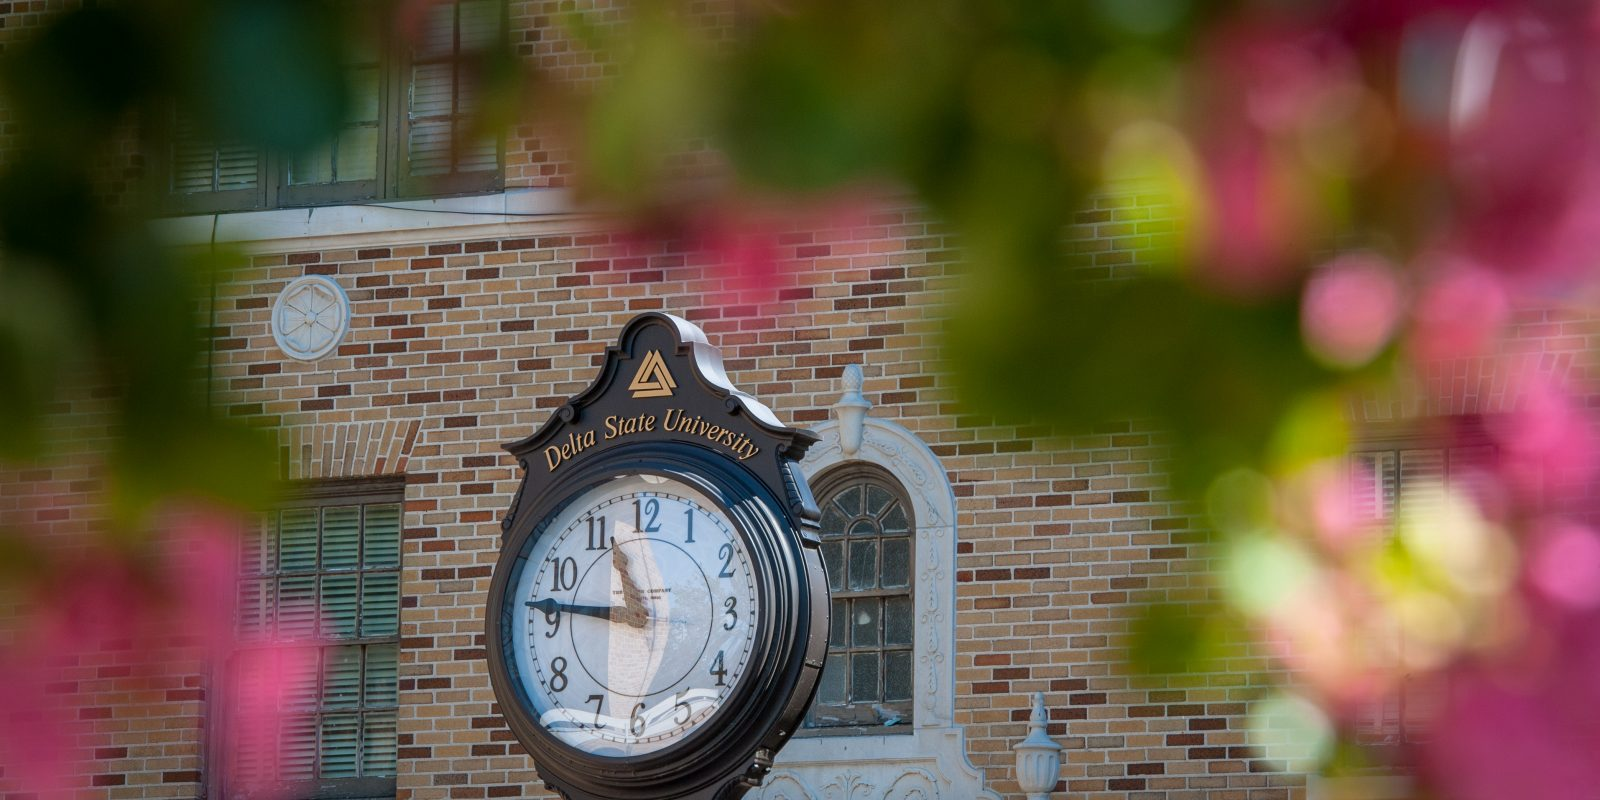 6.28.17-campus-beauty-11-1600x800.jpg